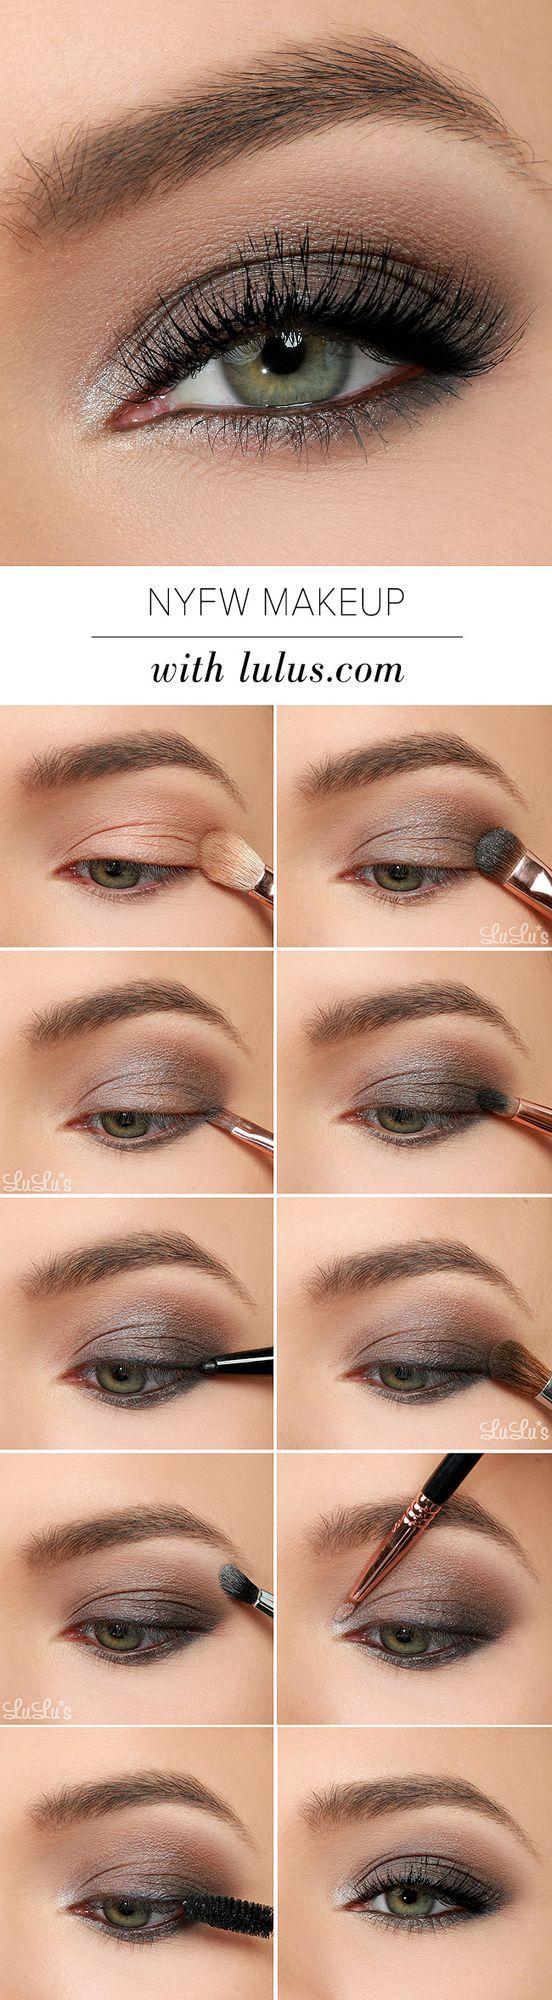 Smokey Eye Makeup For Green Eyes And Blonde Hair Cosmeticstutor